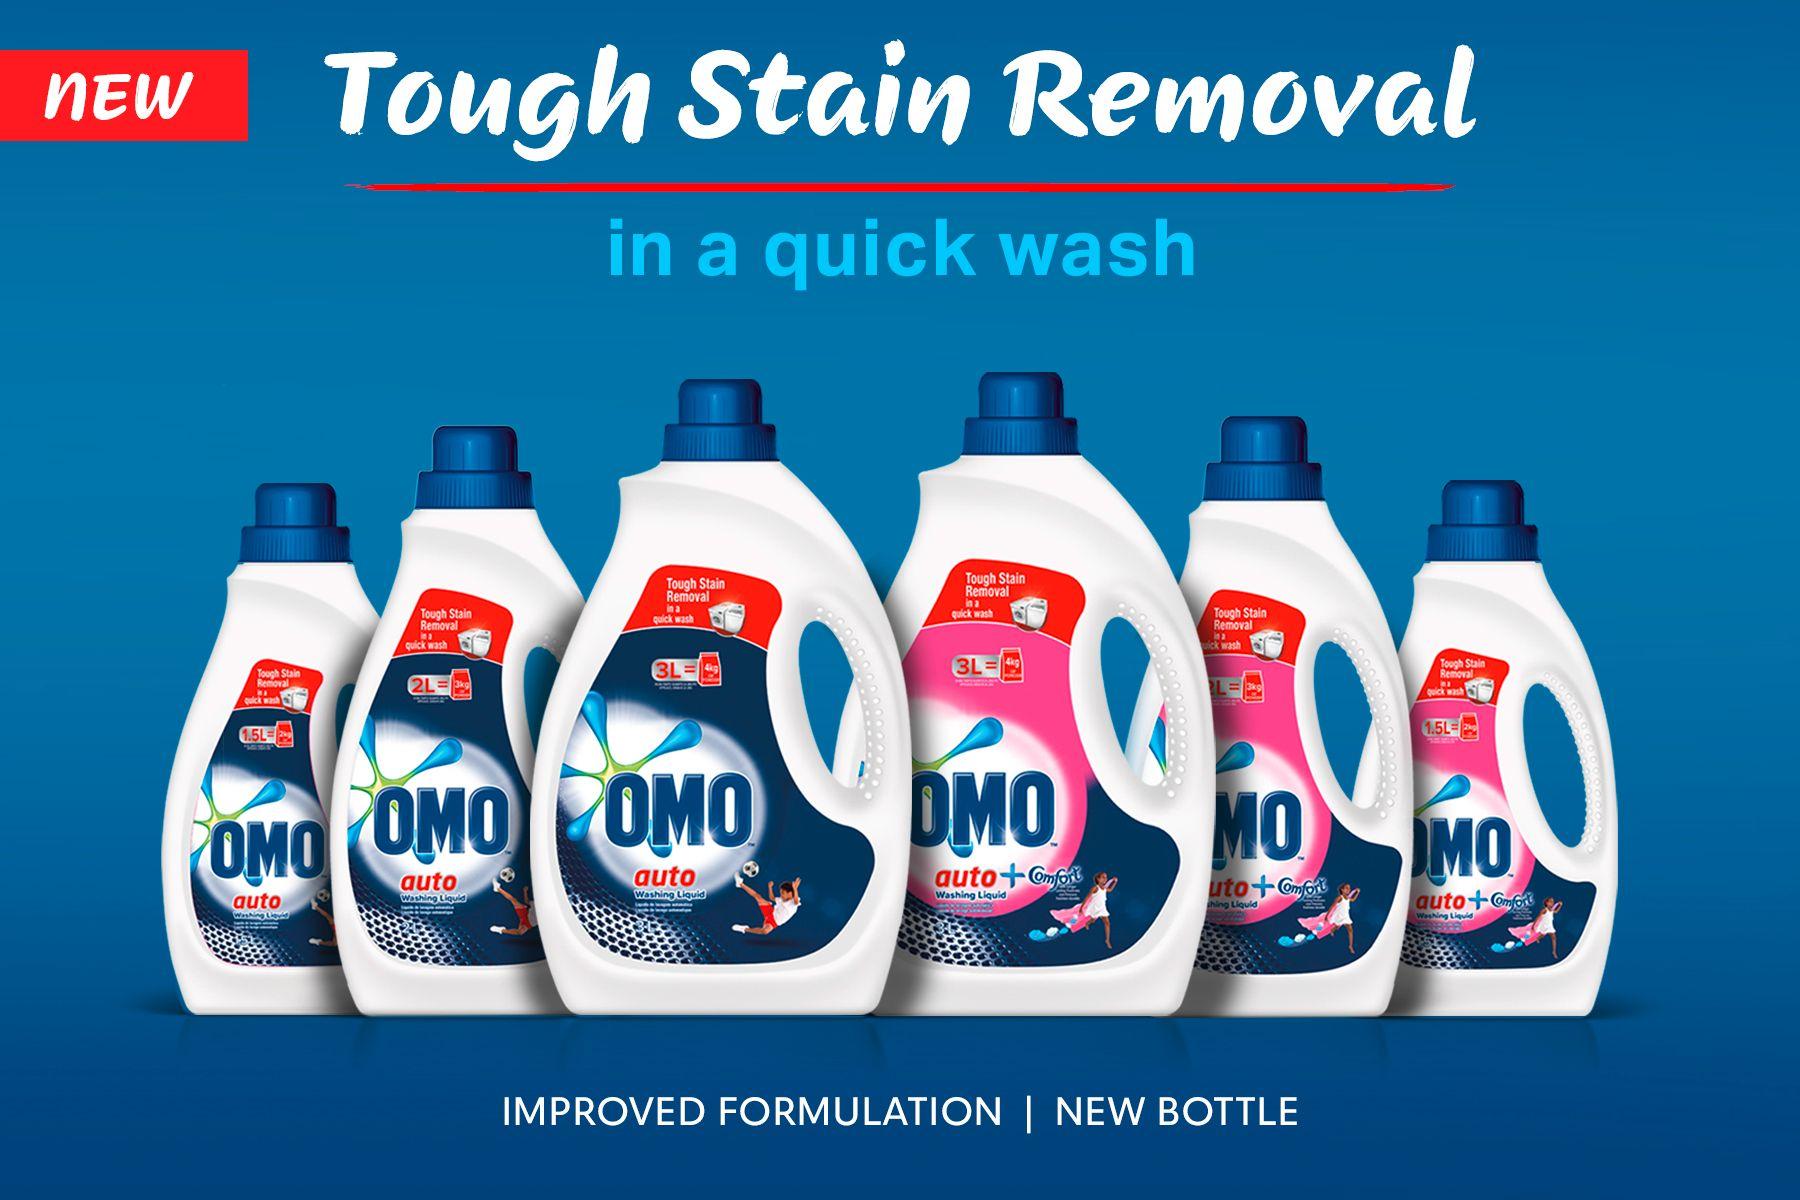 OMO Auto Liquid product range, text: